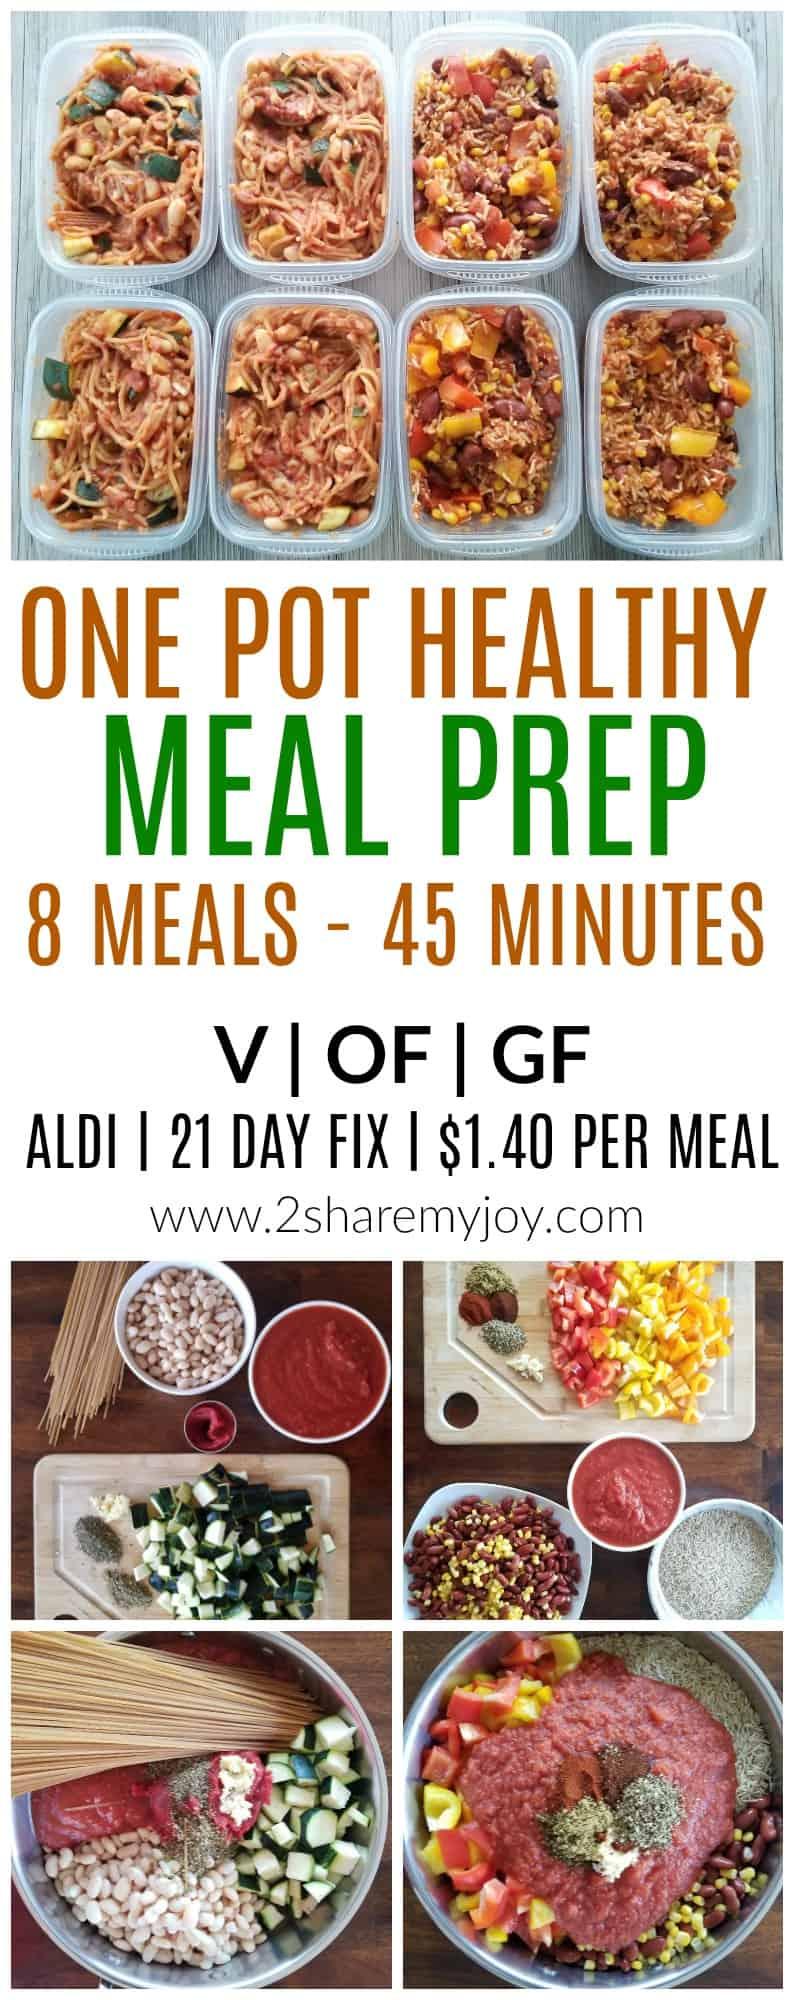 Vegan Meal Prep On A Budget 8 Meals Under 45 Minutes 2sharemyjoy